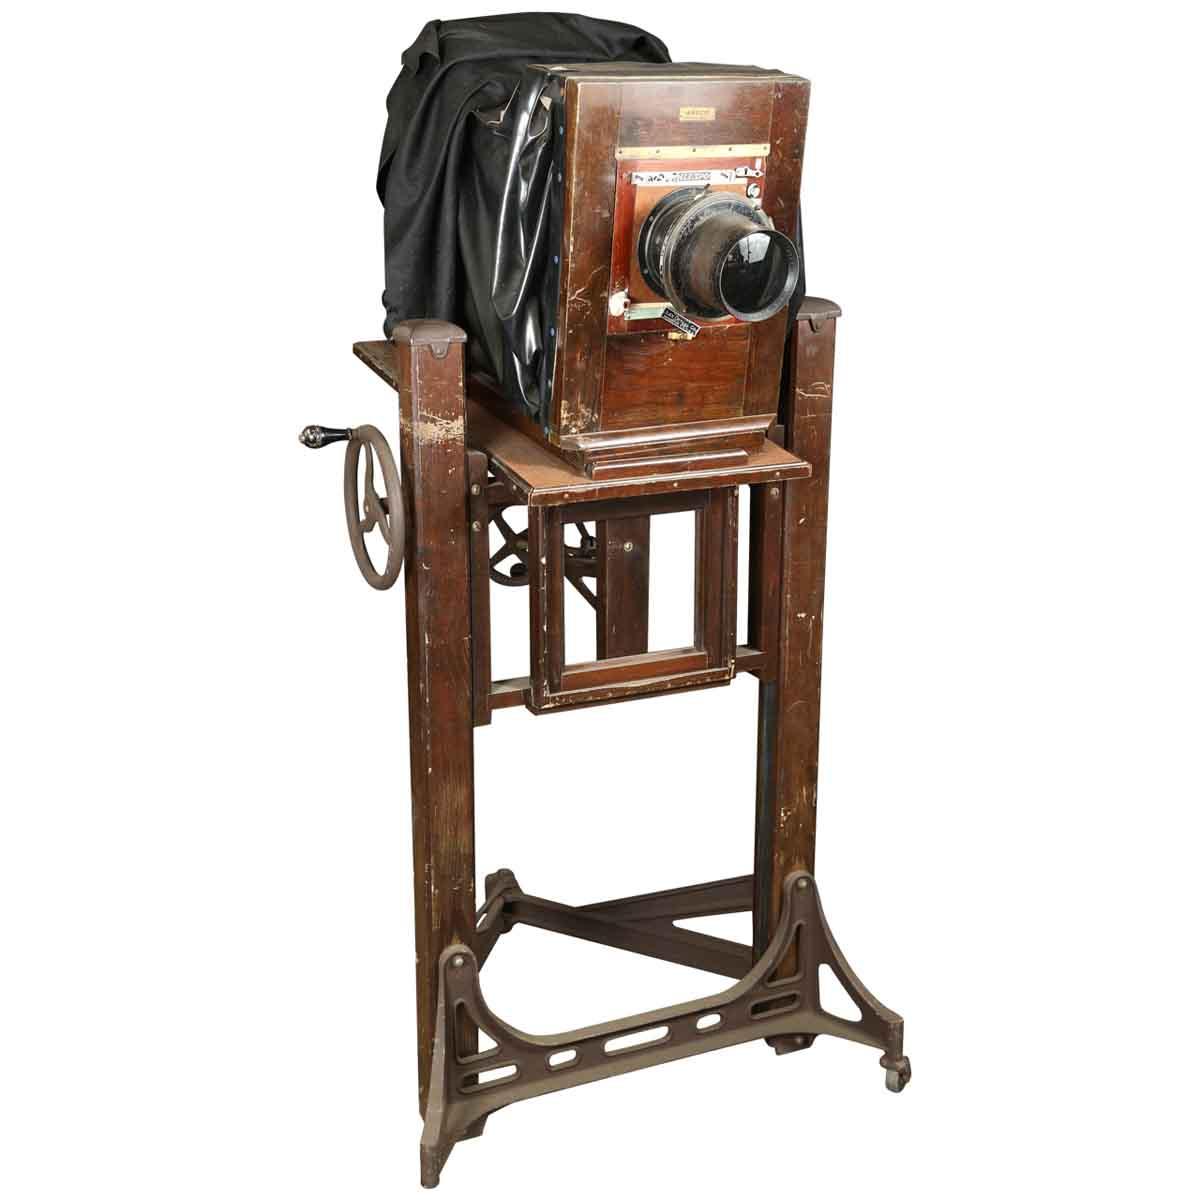 Antique Camera & Base